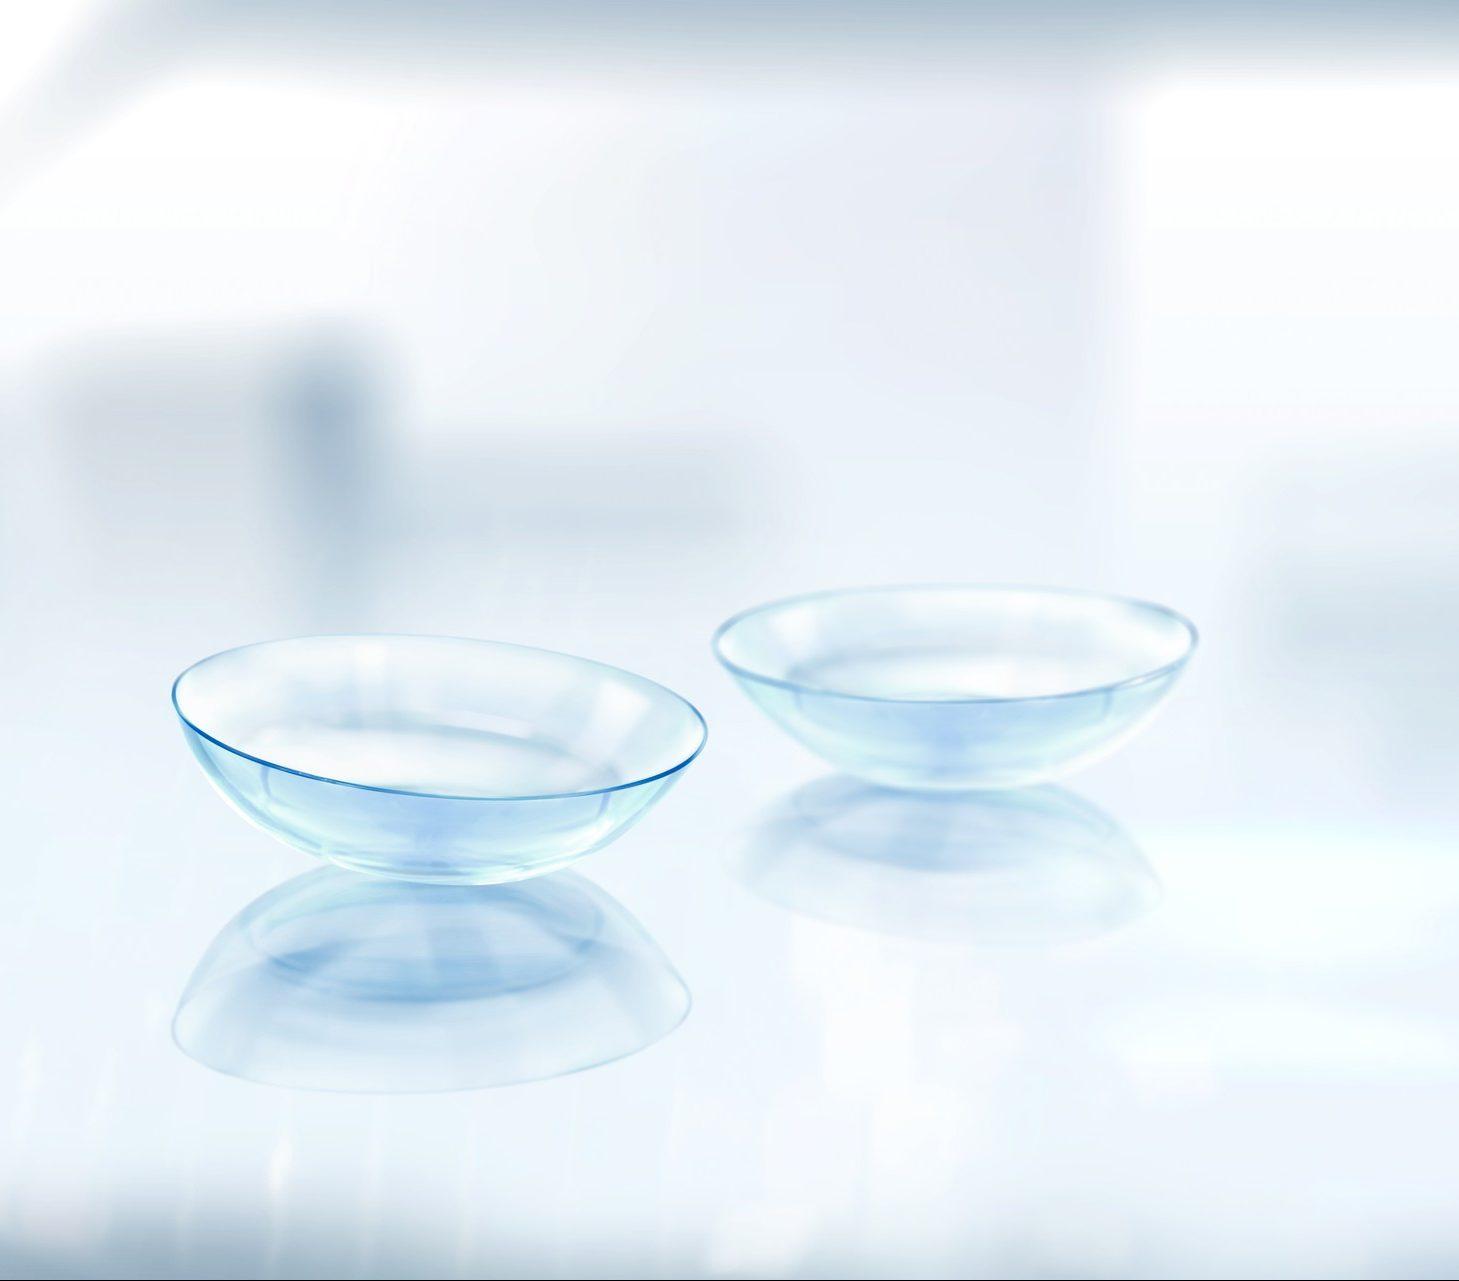 Formstabilie Kontaktlinsen